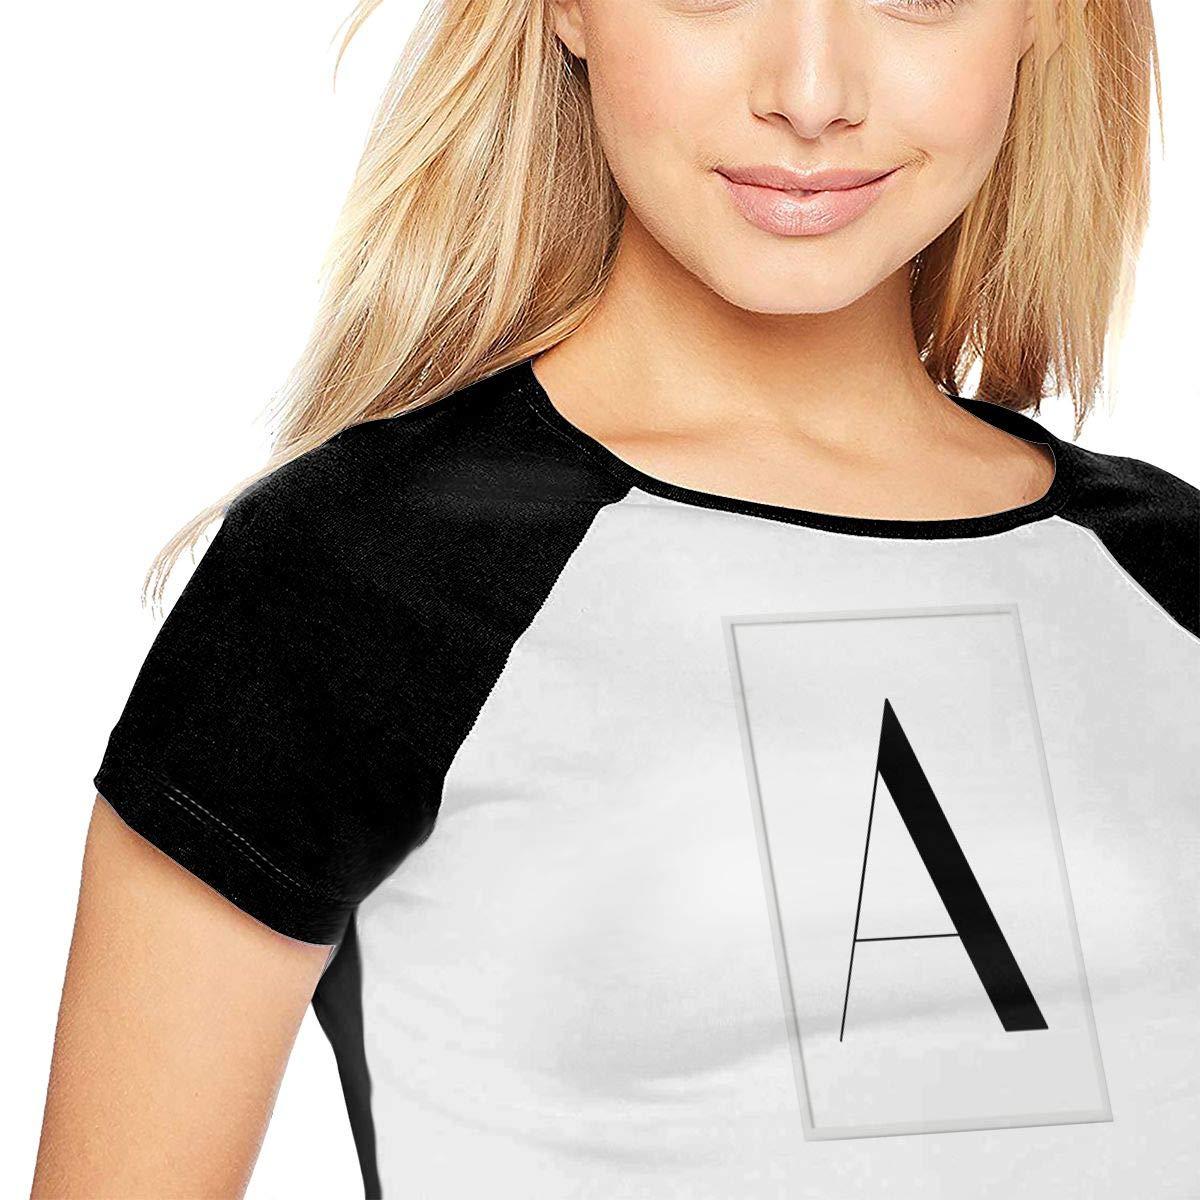 IofuGofu Letter Print Womens Personalized Fashion Casual Baseball Short-Sleeved T-Shirt